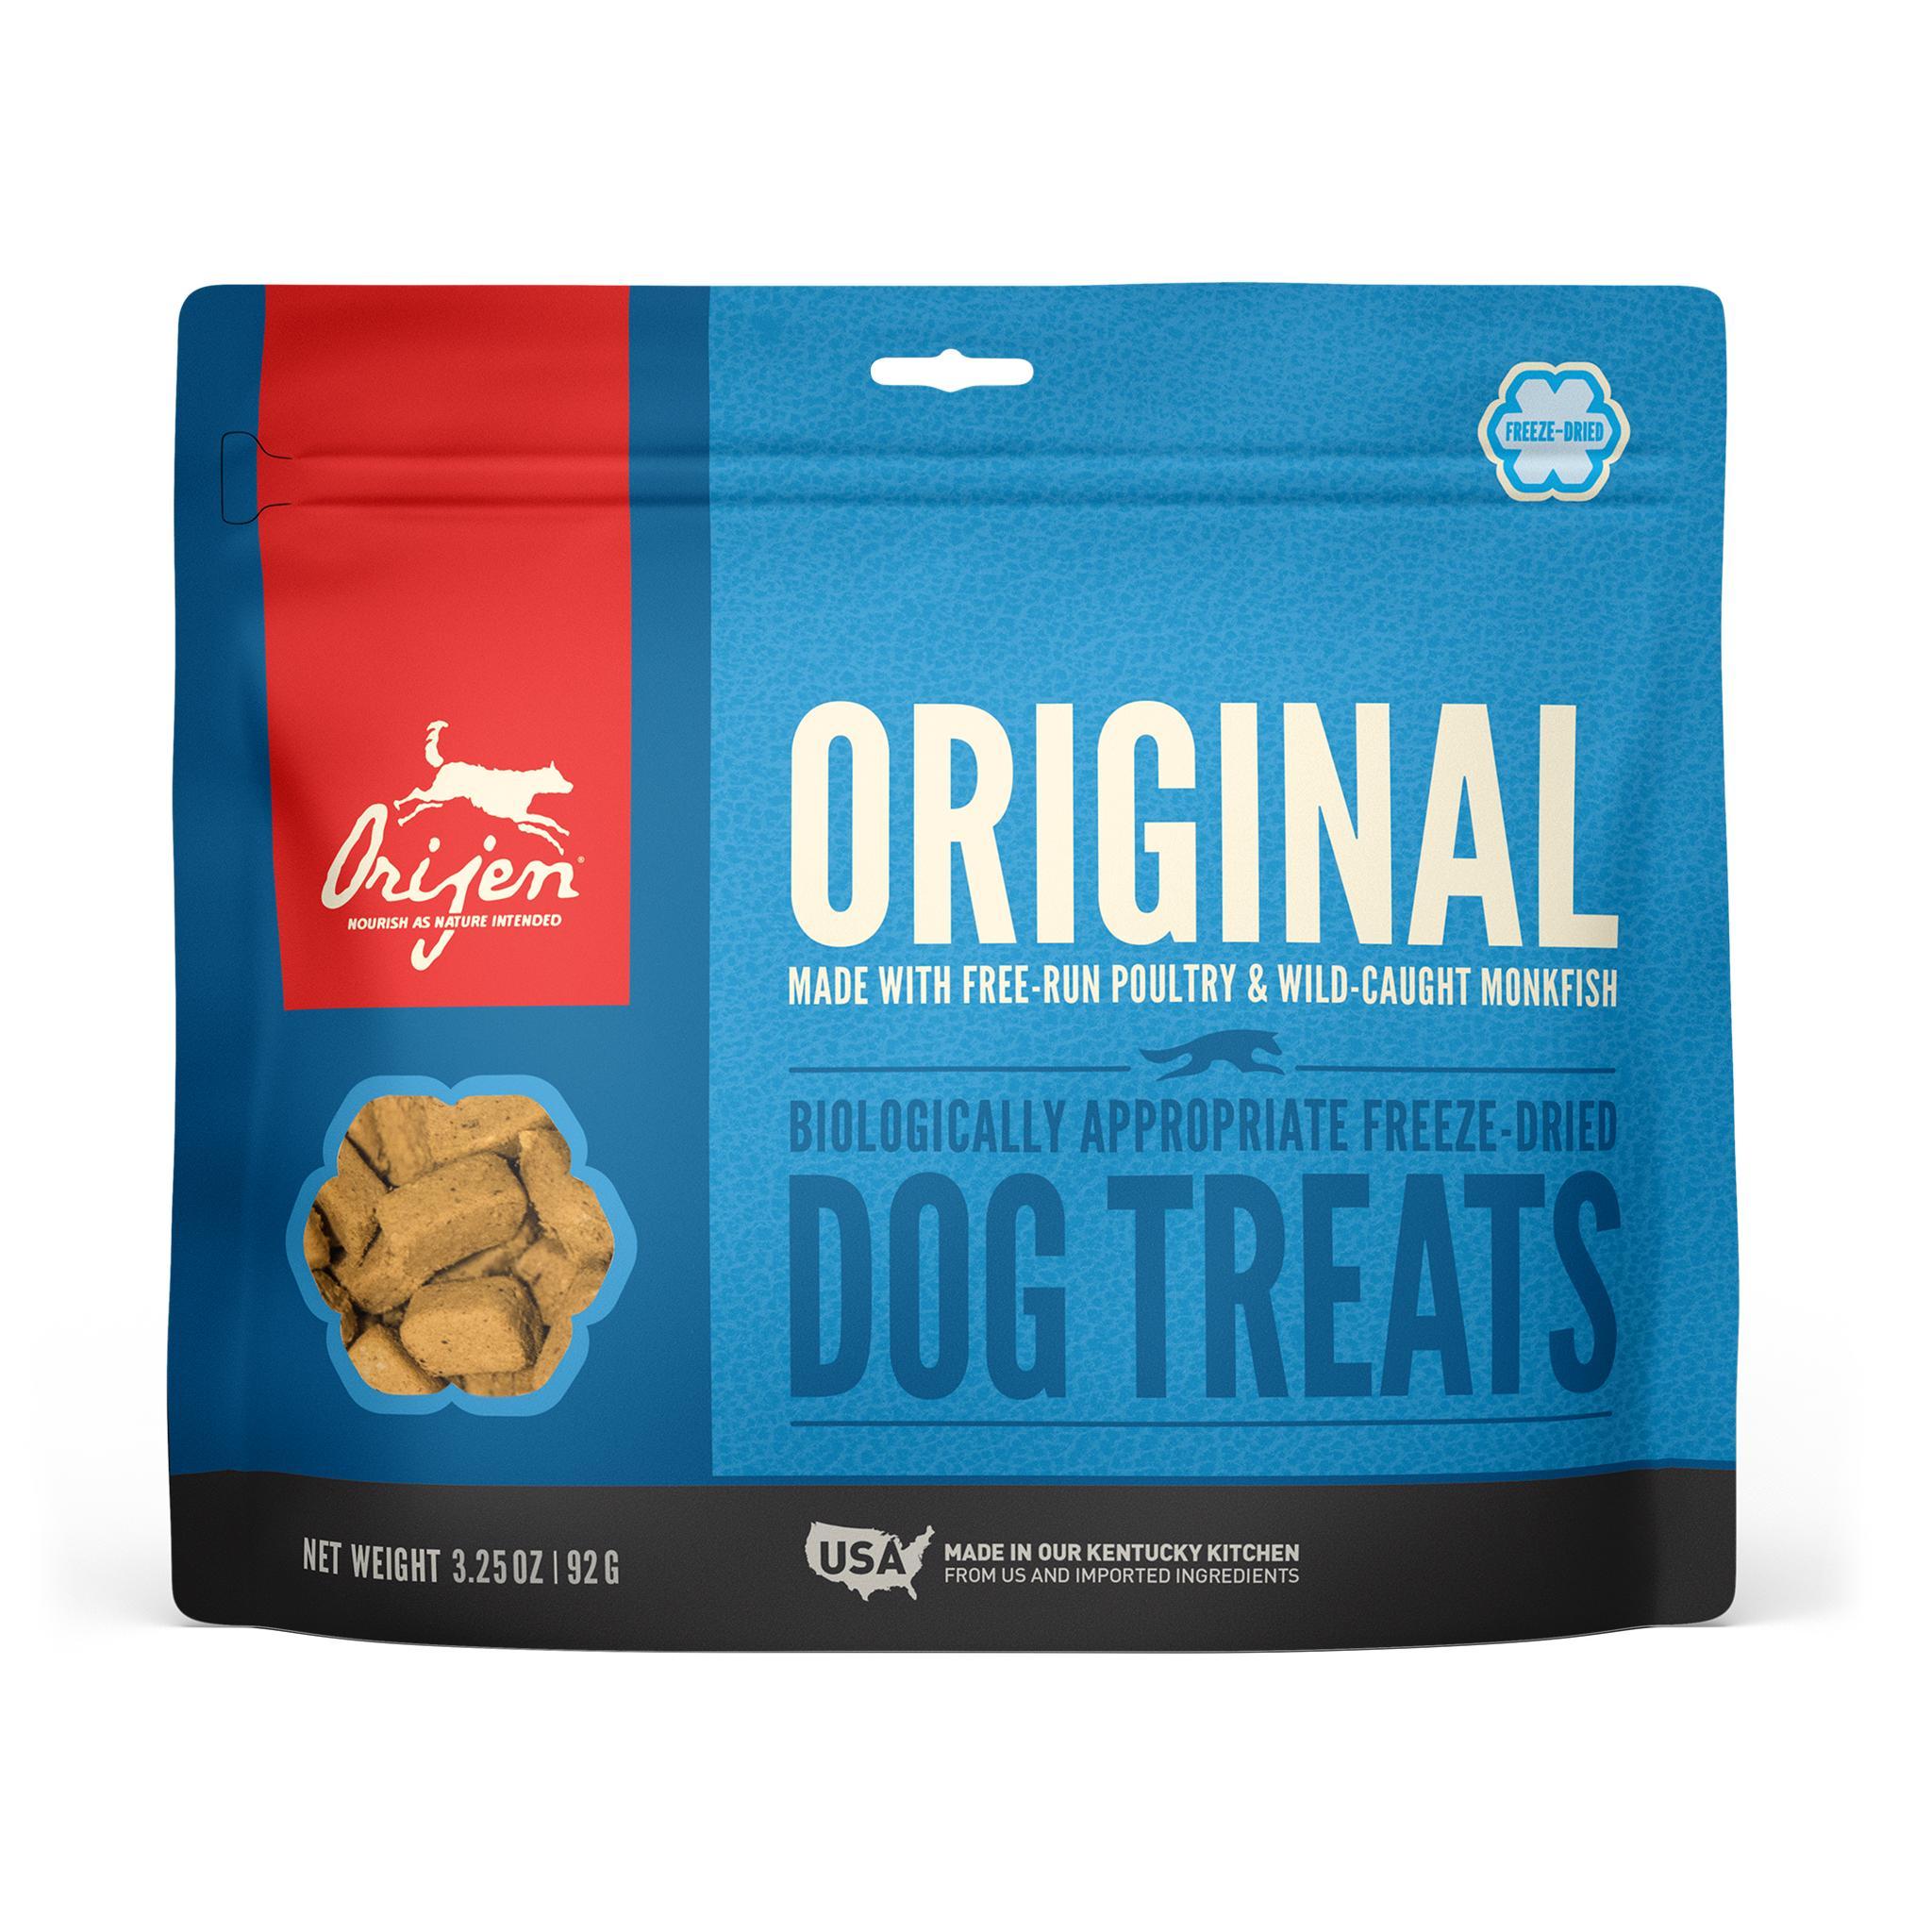 ORIJEN Original Grain-Free Freeze-Dried Dog Treats, 3.25-oz